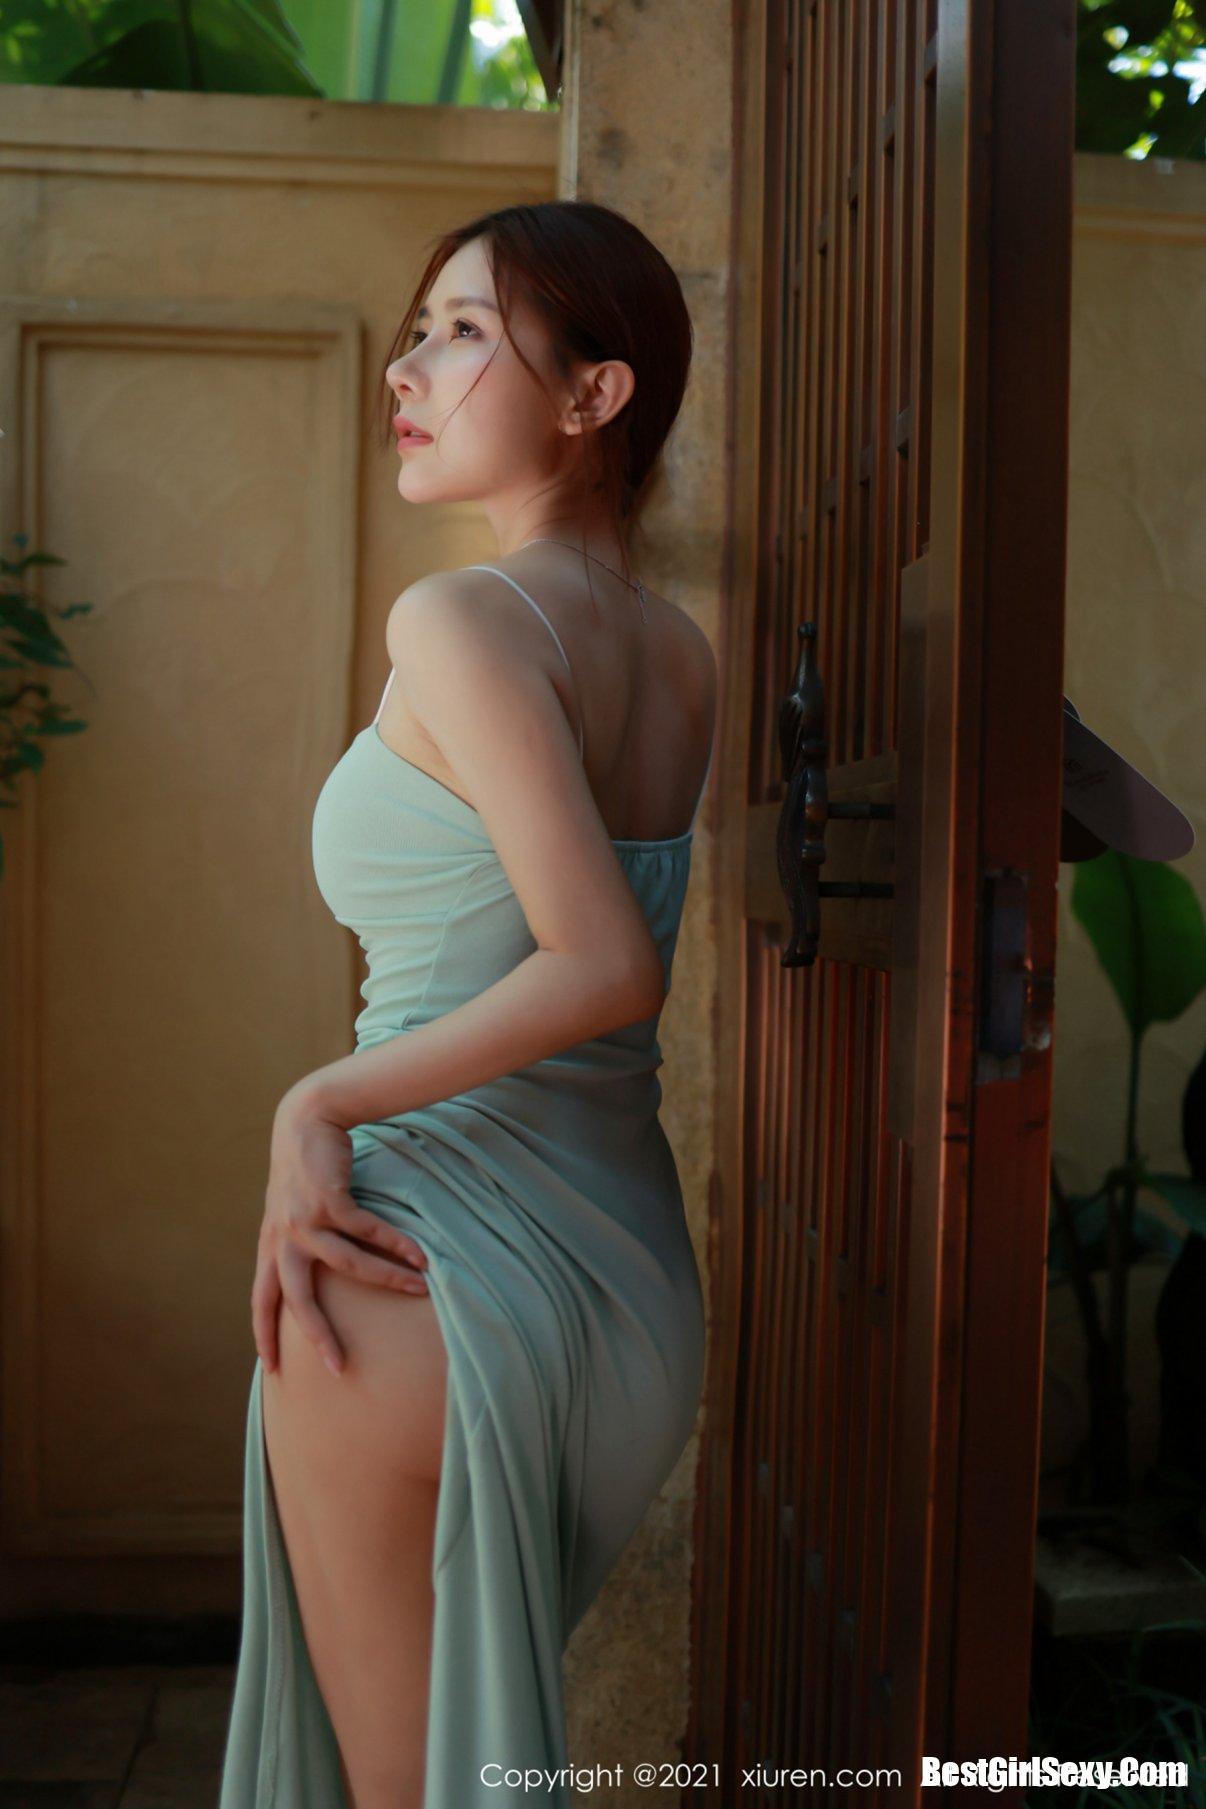 尹甜甜, Yi Tian Tian, XiuRen秀人网 No.3434 Yi Tian Tian, XiuRen秀人网 No.3434